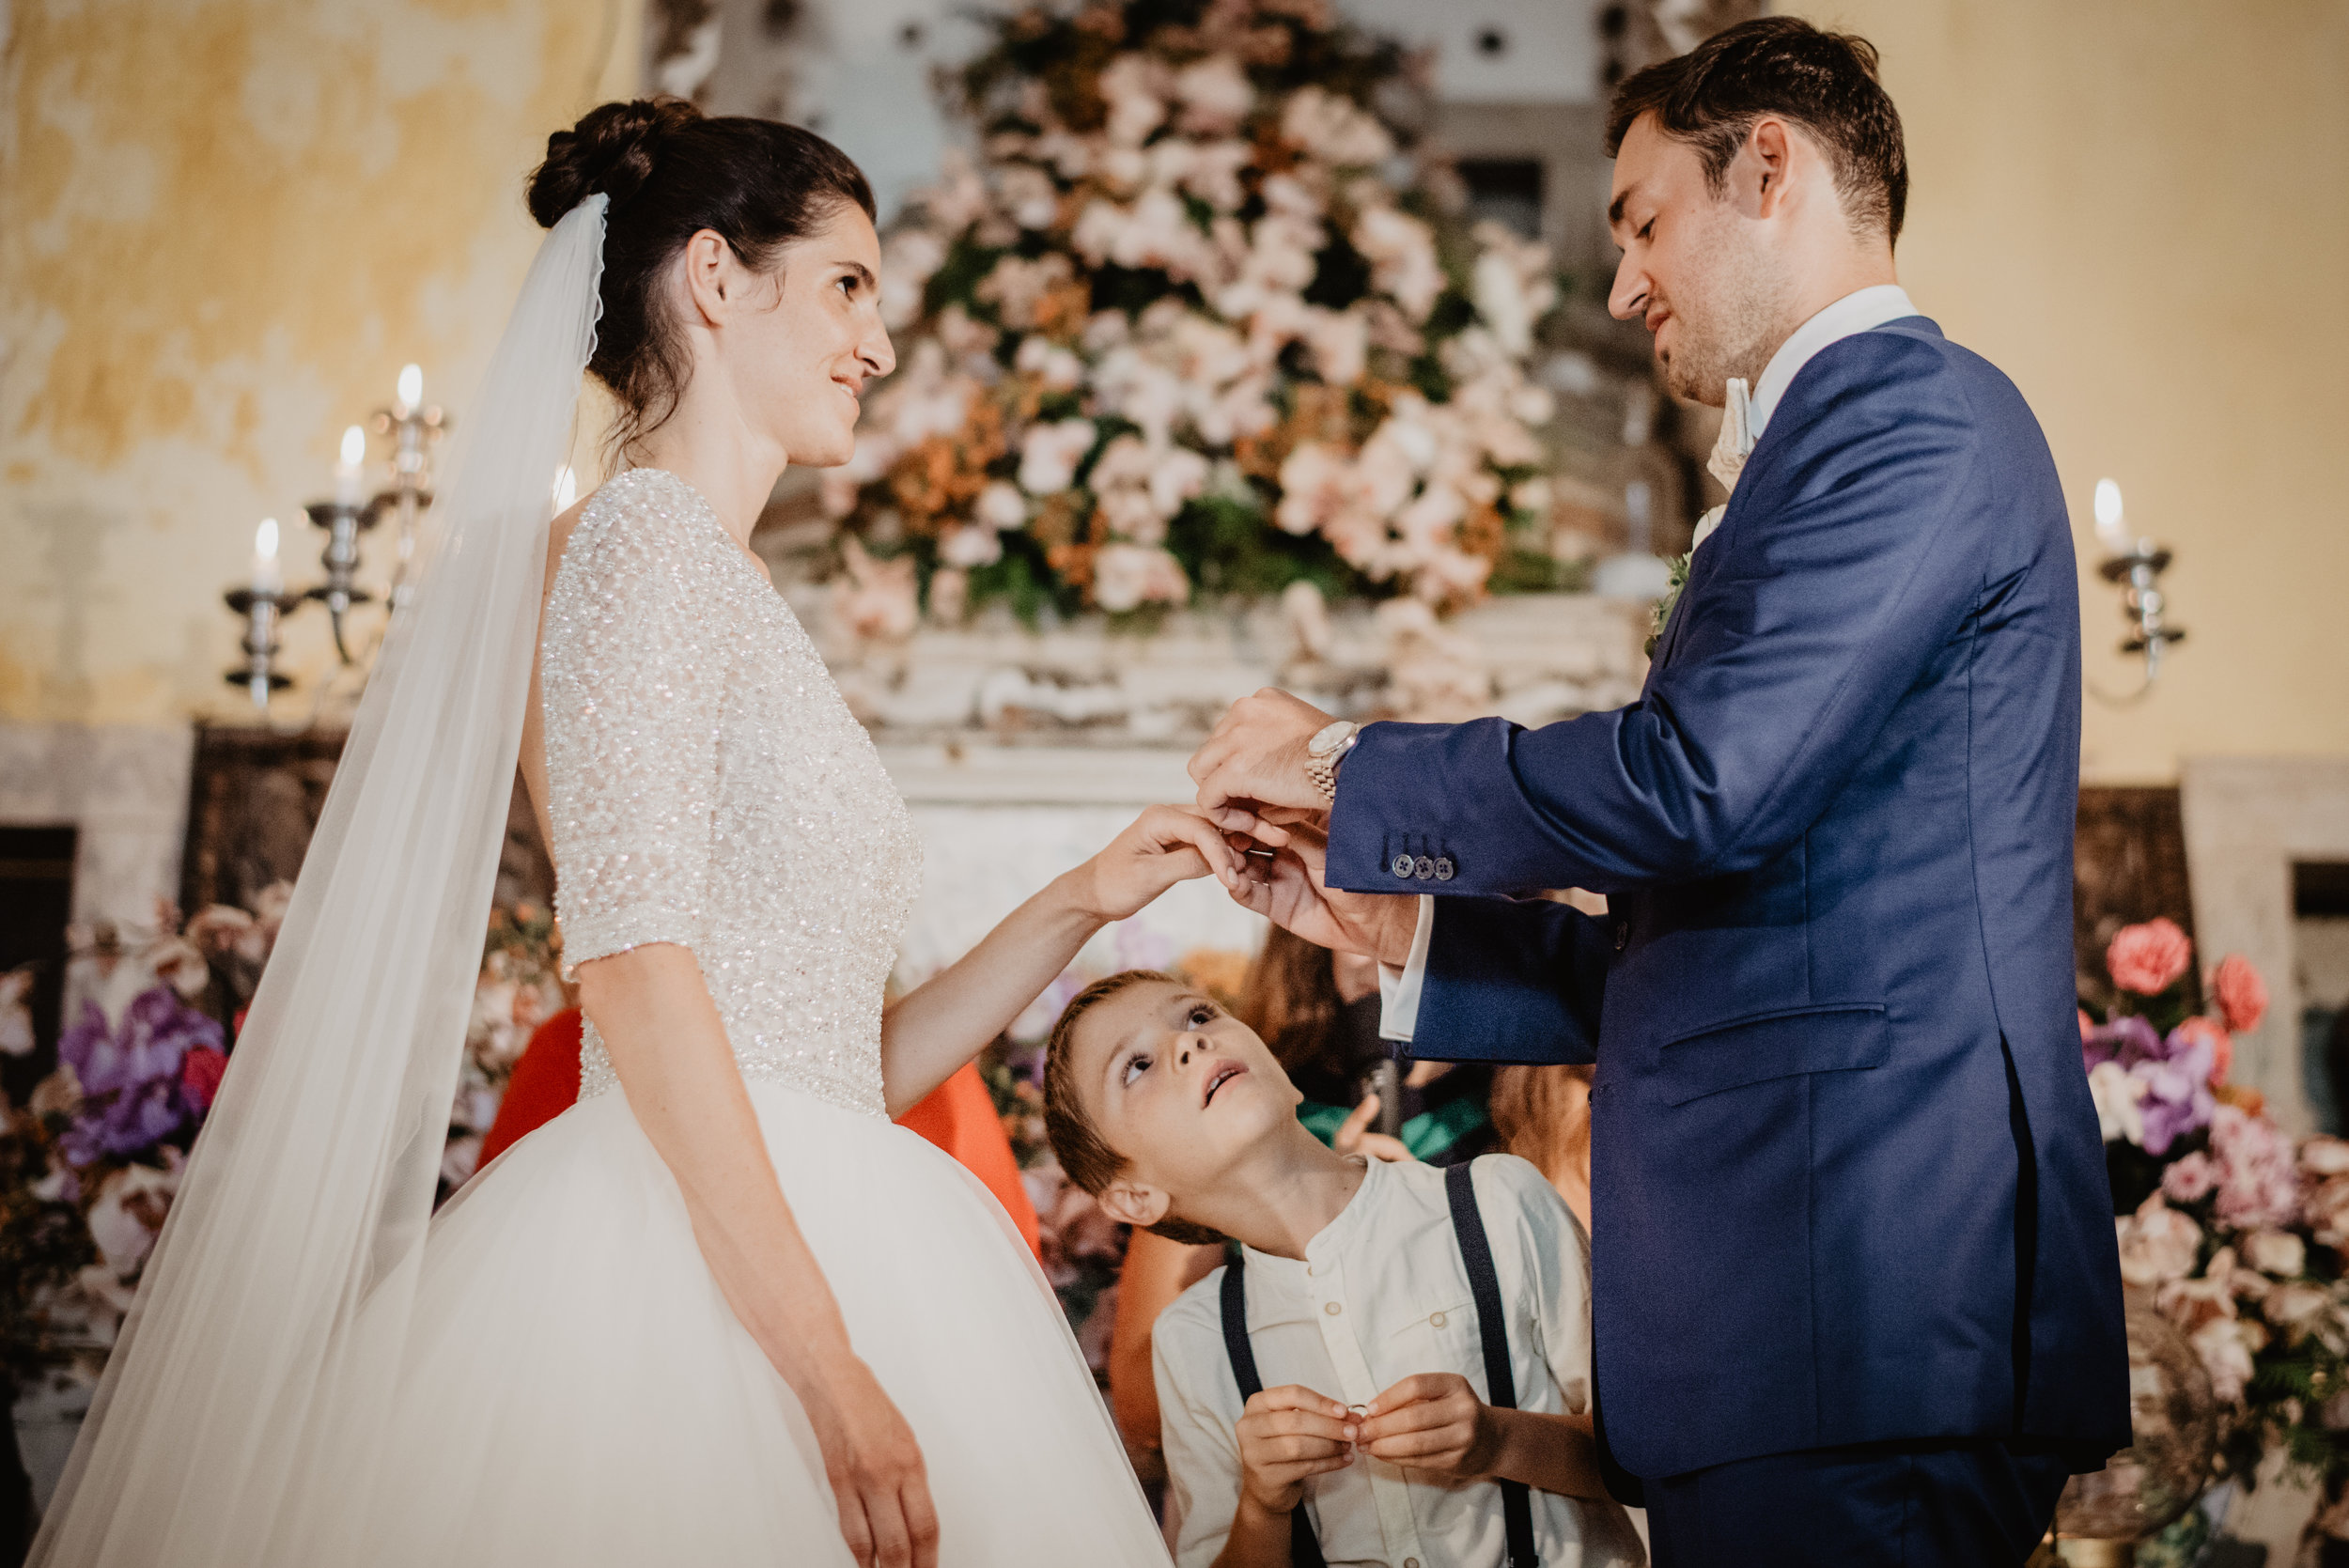 Lapela-photography-wedding-sintra-portugal-63.jpg